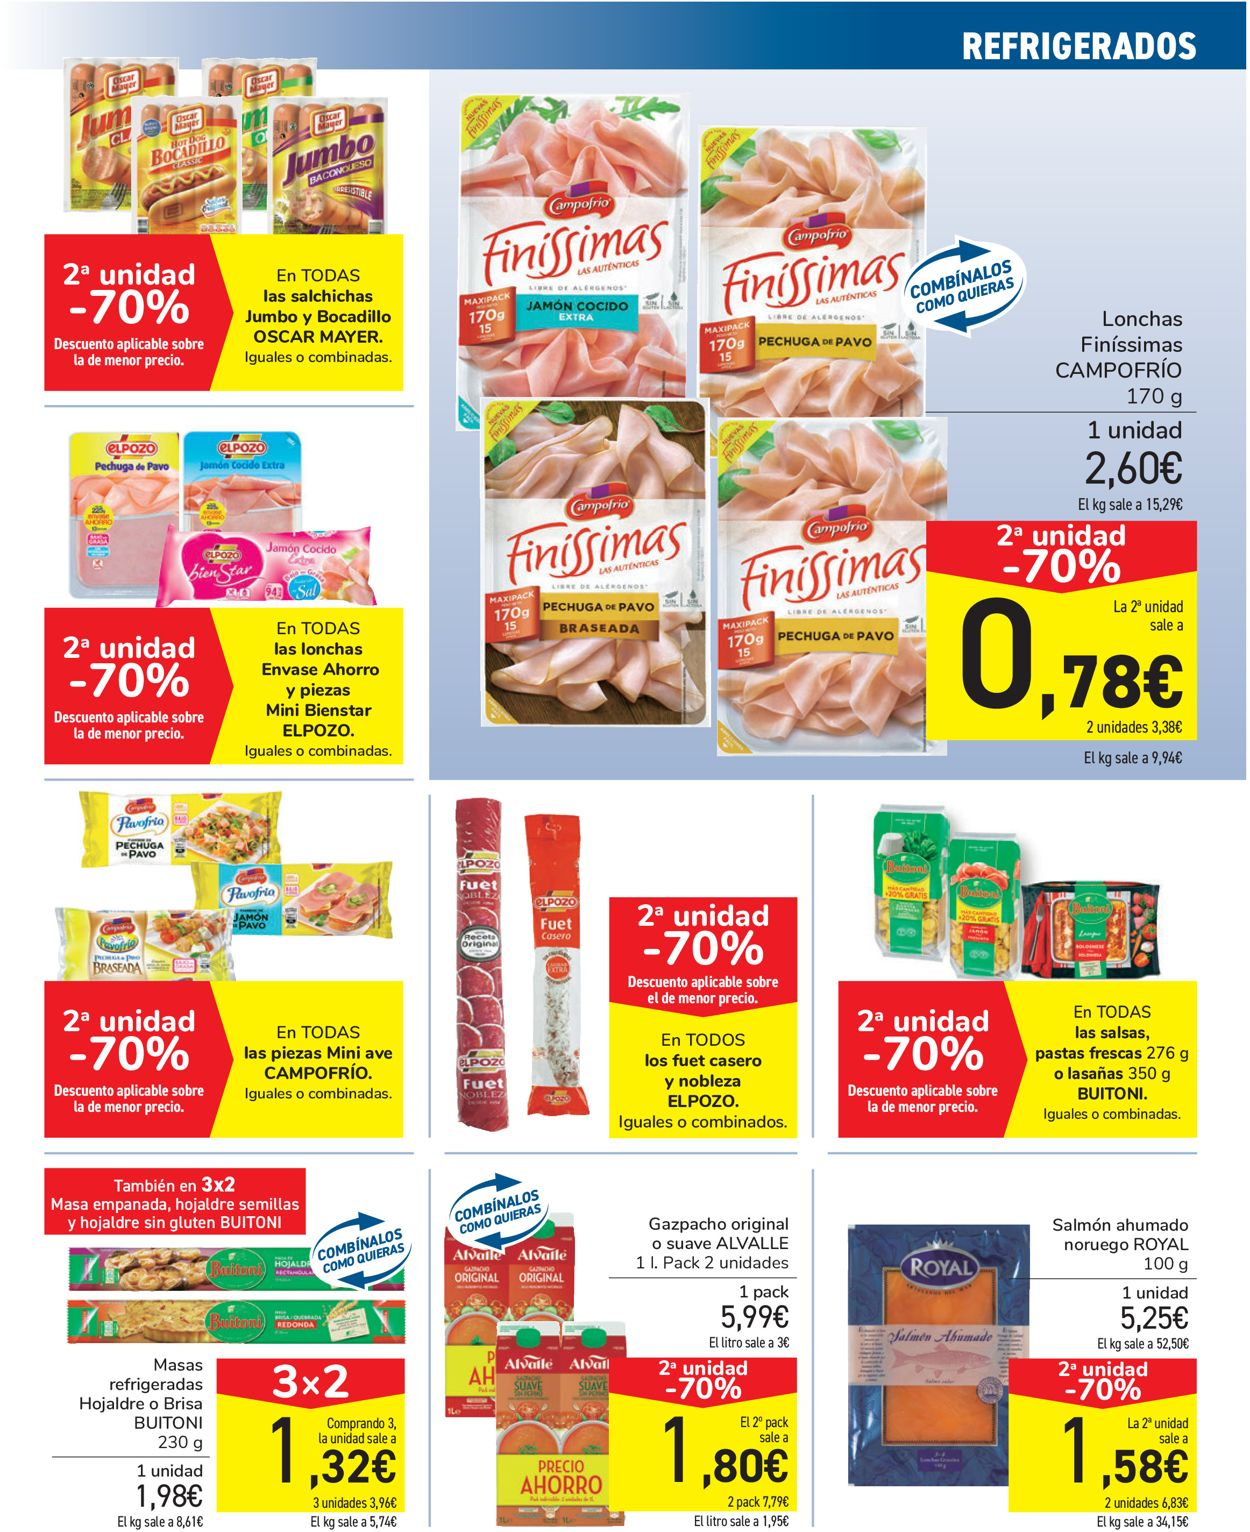 Carrefour Folleto - 26.03-13.04.2020 (Página 17)